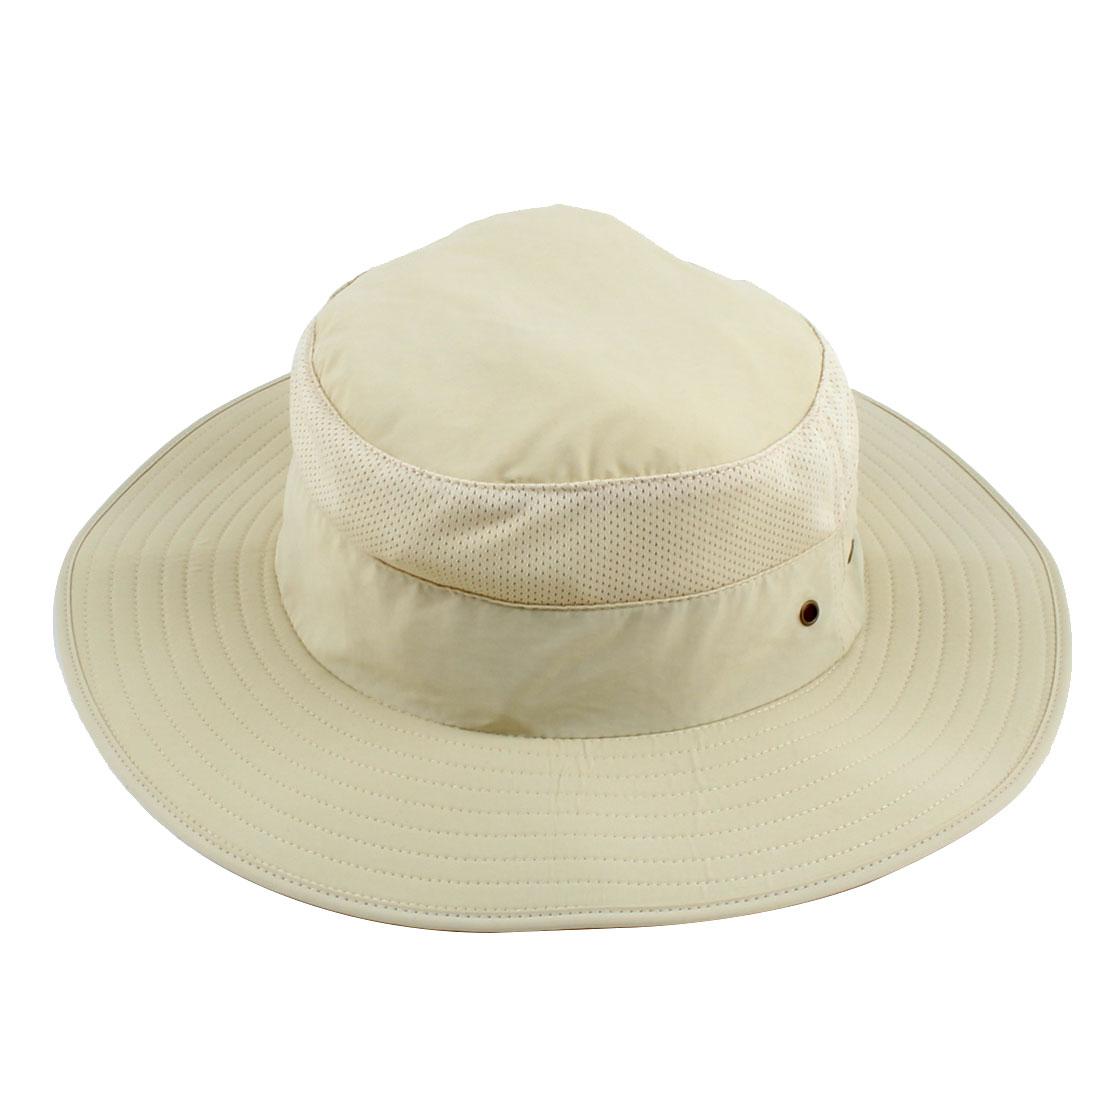 Fisherman Nylon Outdoor Sports Climbing Wide Brim Protector Bucket Sun Summer Cap Fishing Hat Beige